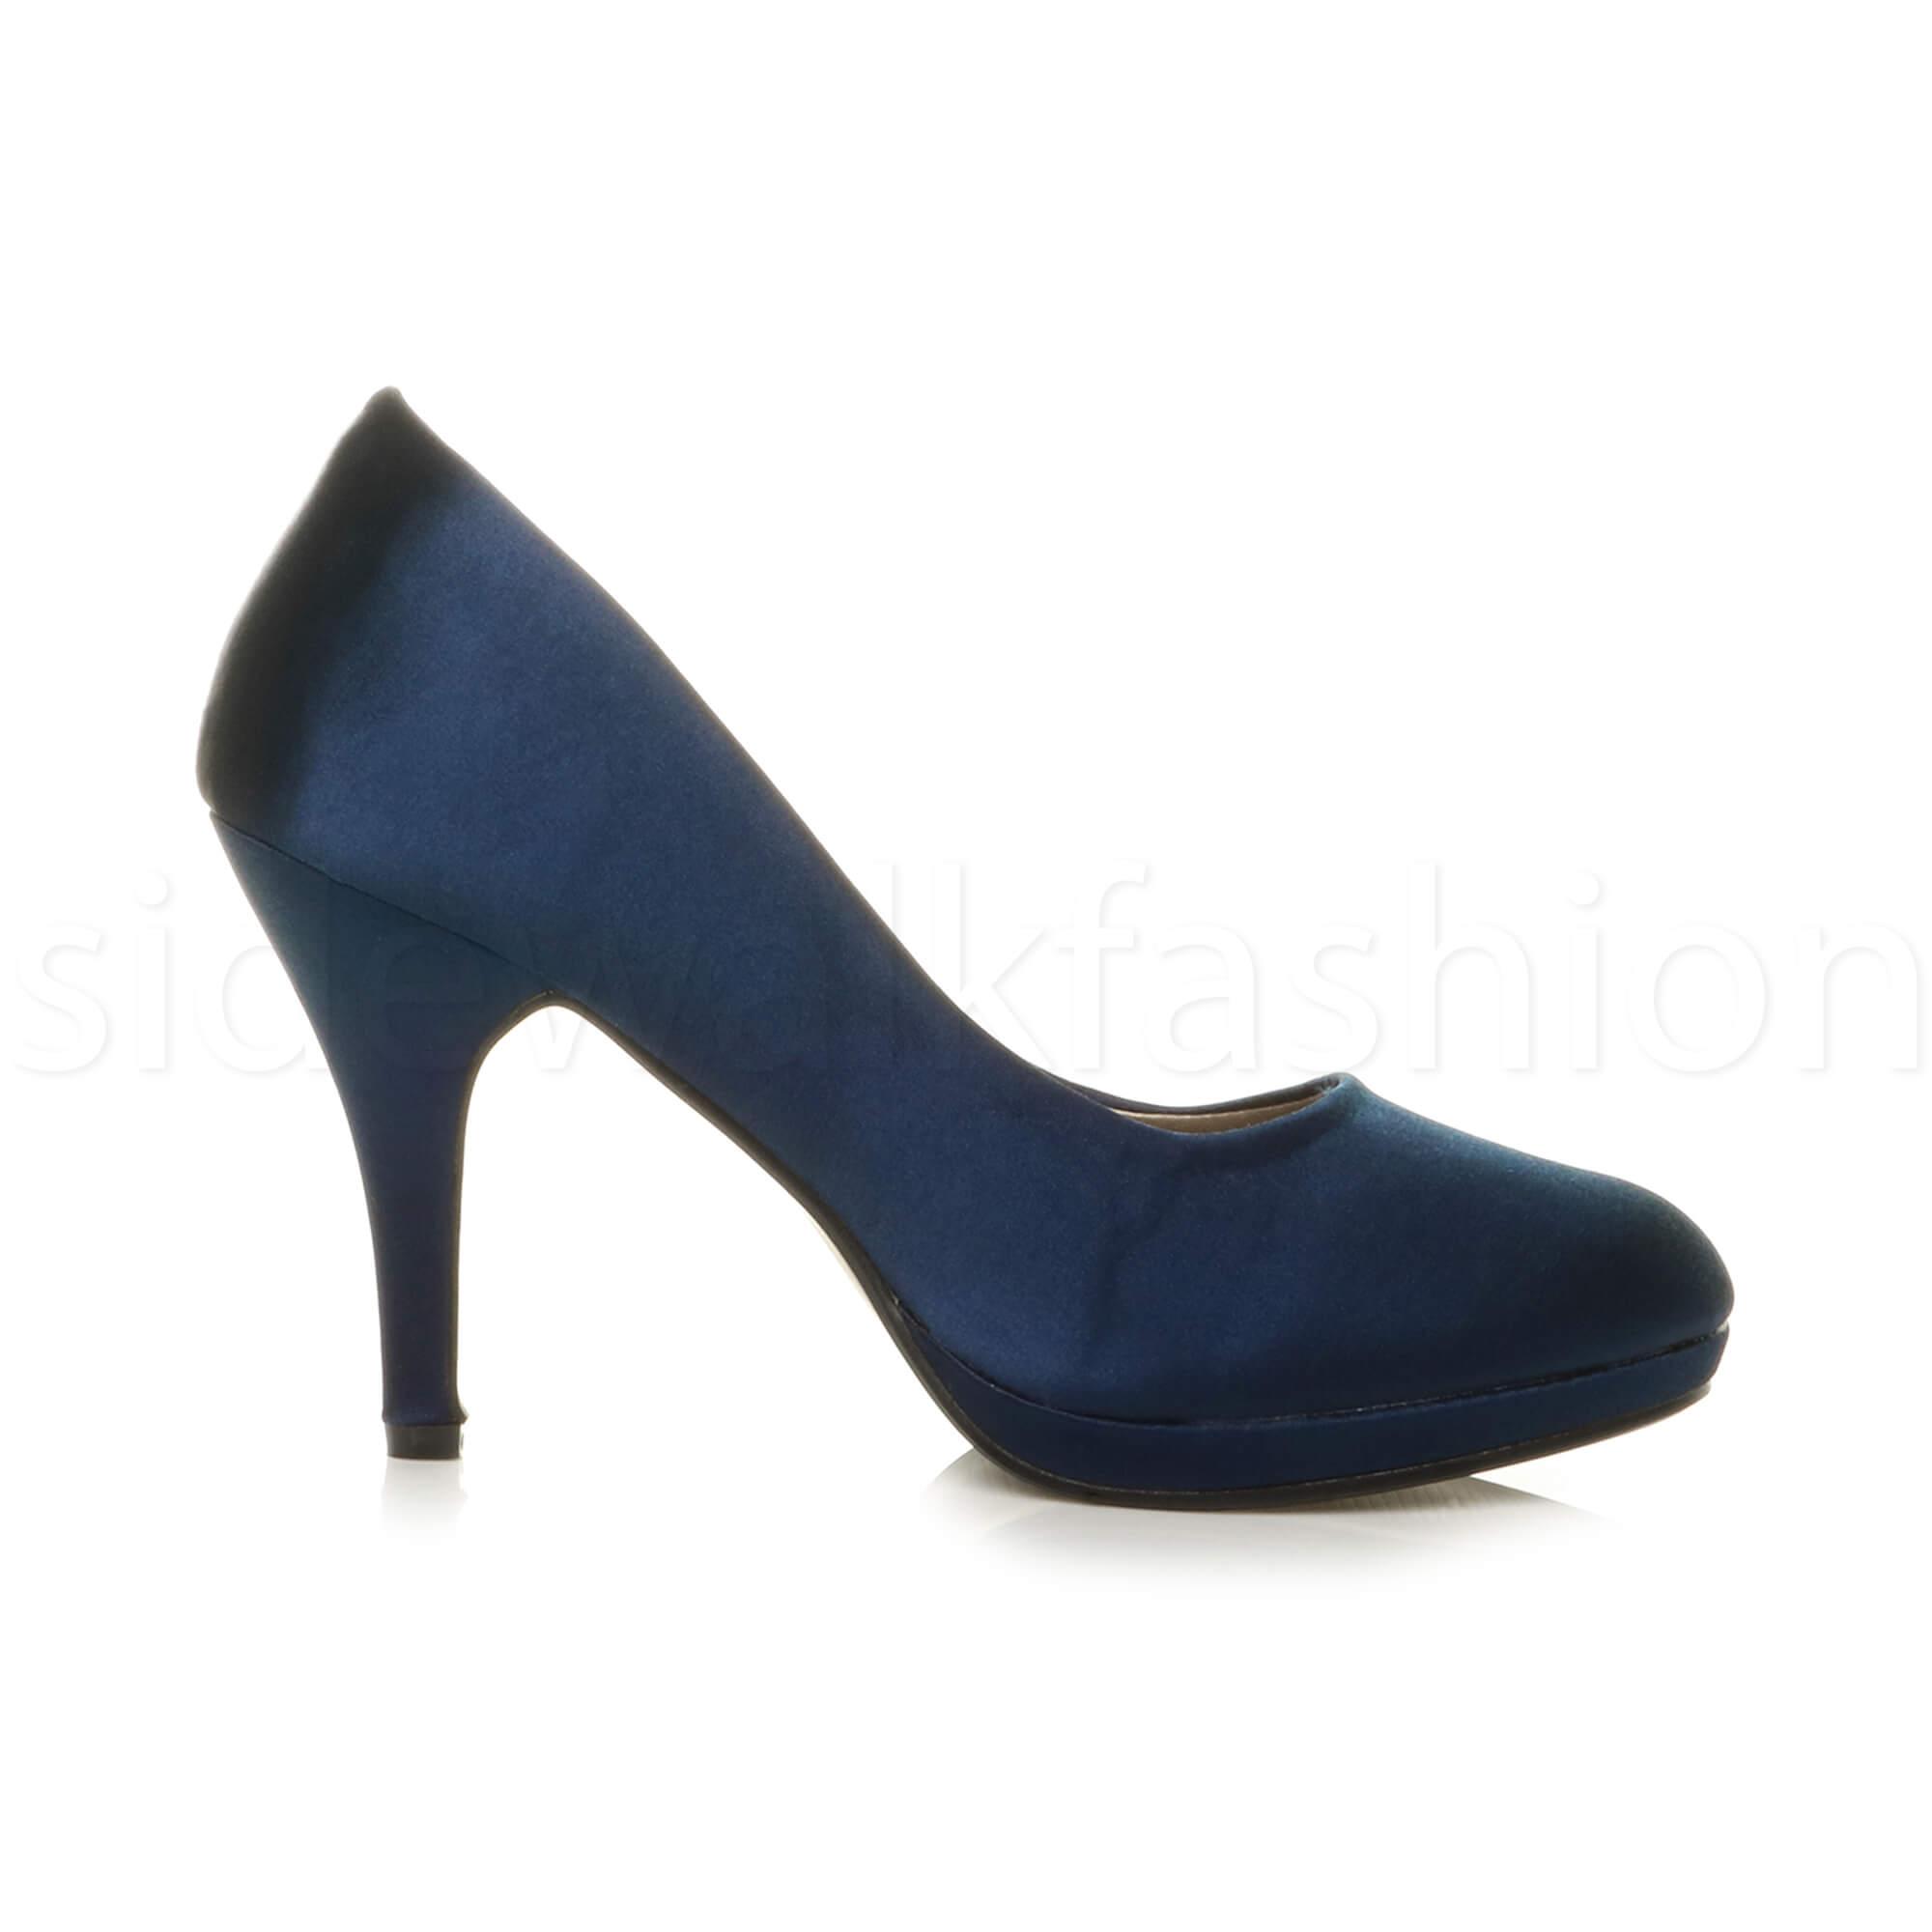 Womens-ladies-high-mid-heel-platform-wedding-evening-bridesmaid-court-shoes-size thumbnail 116